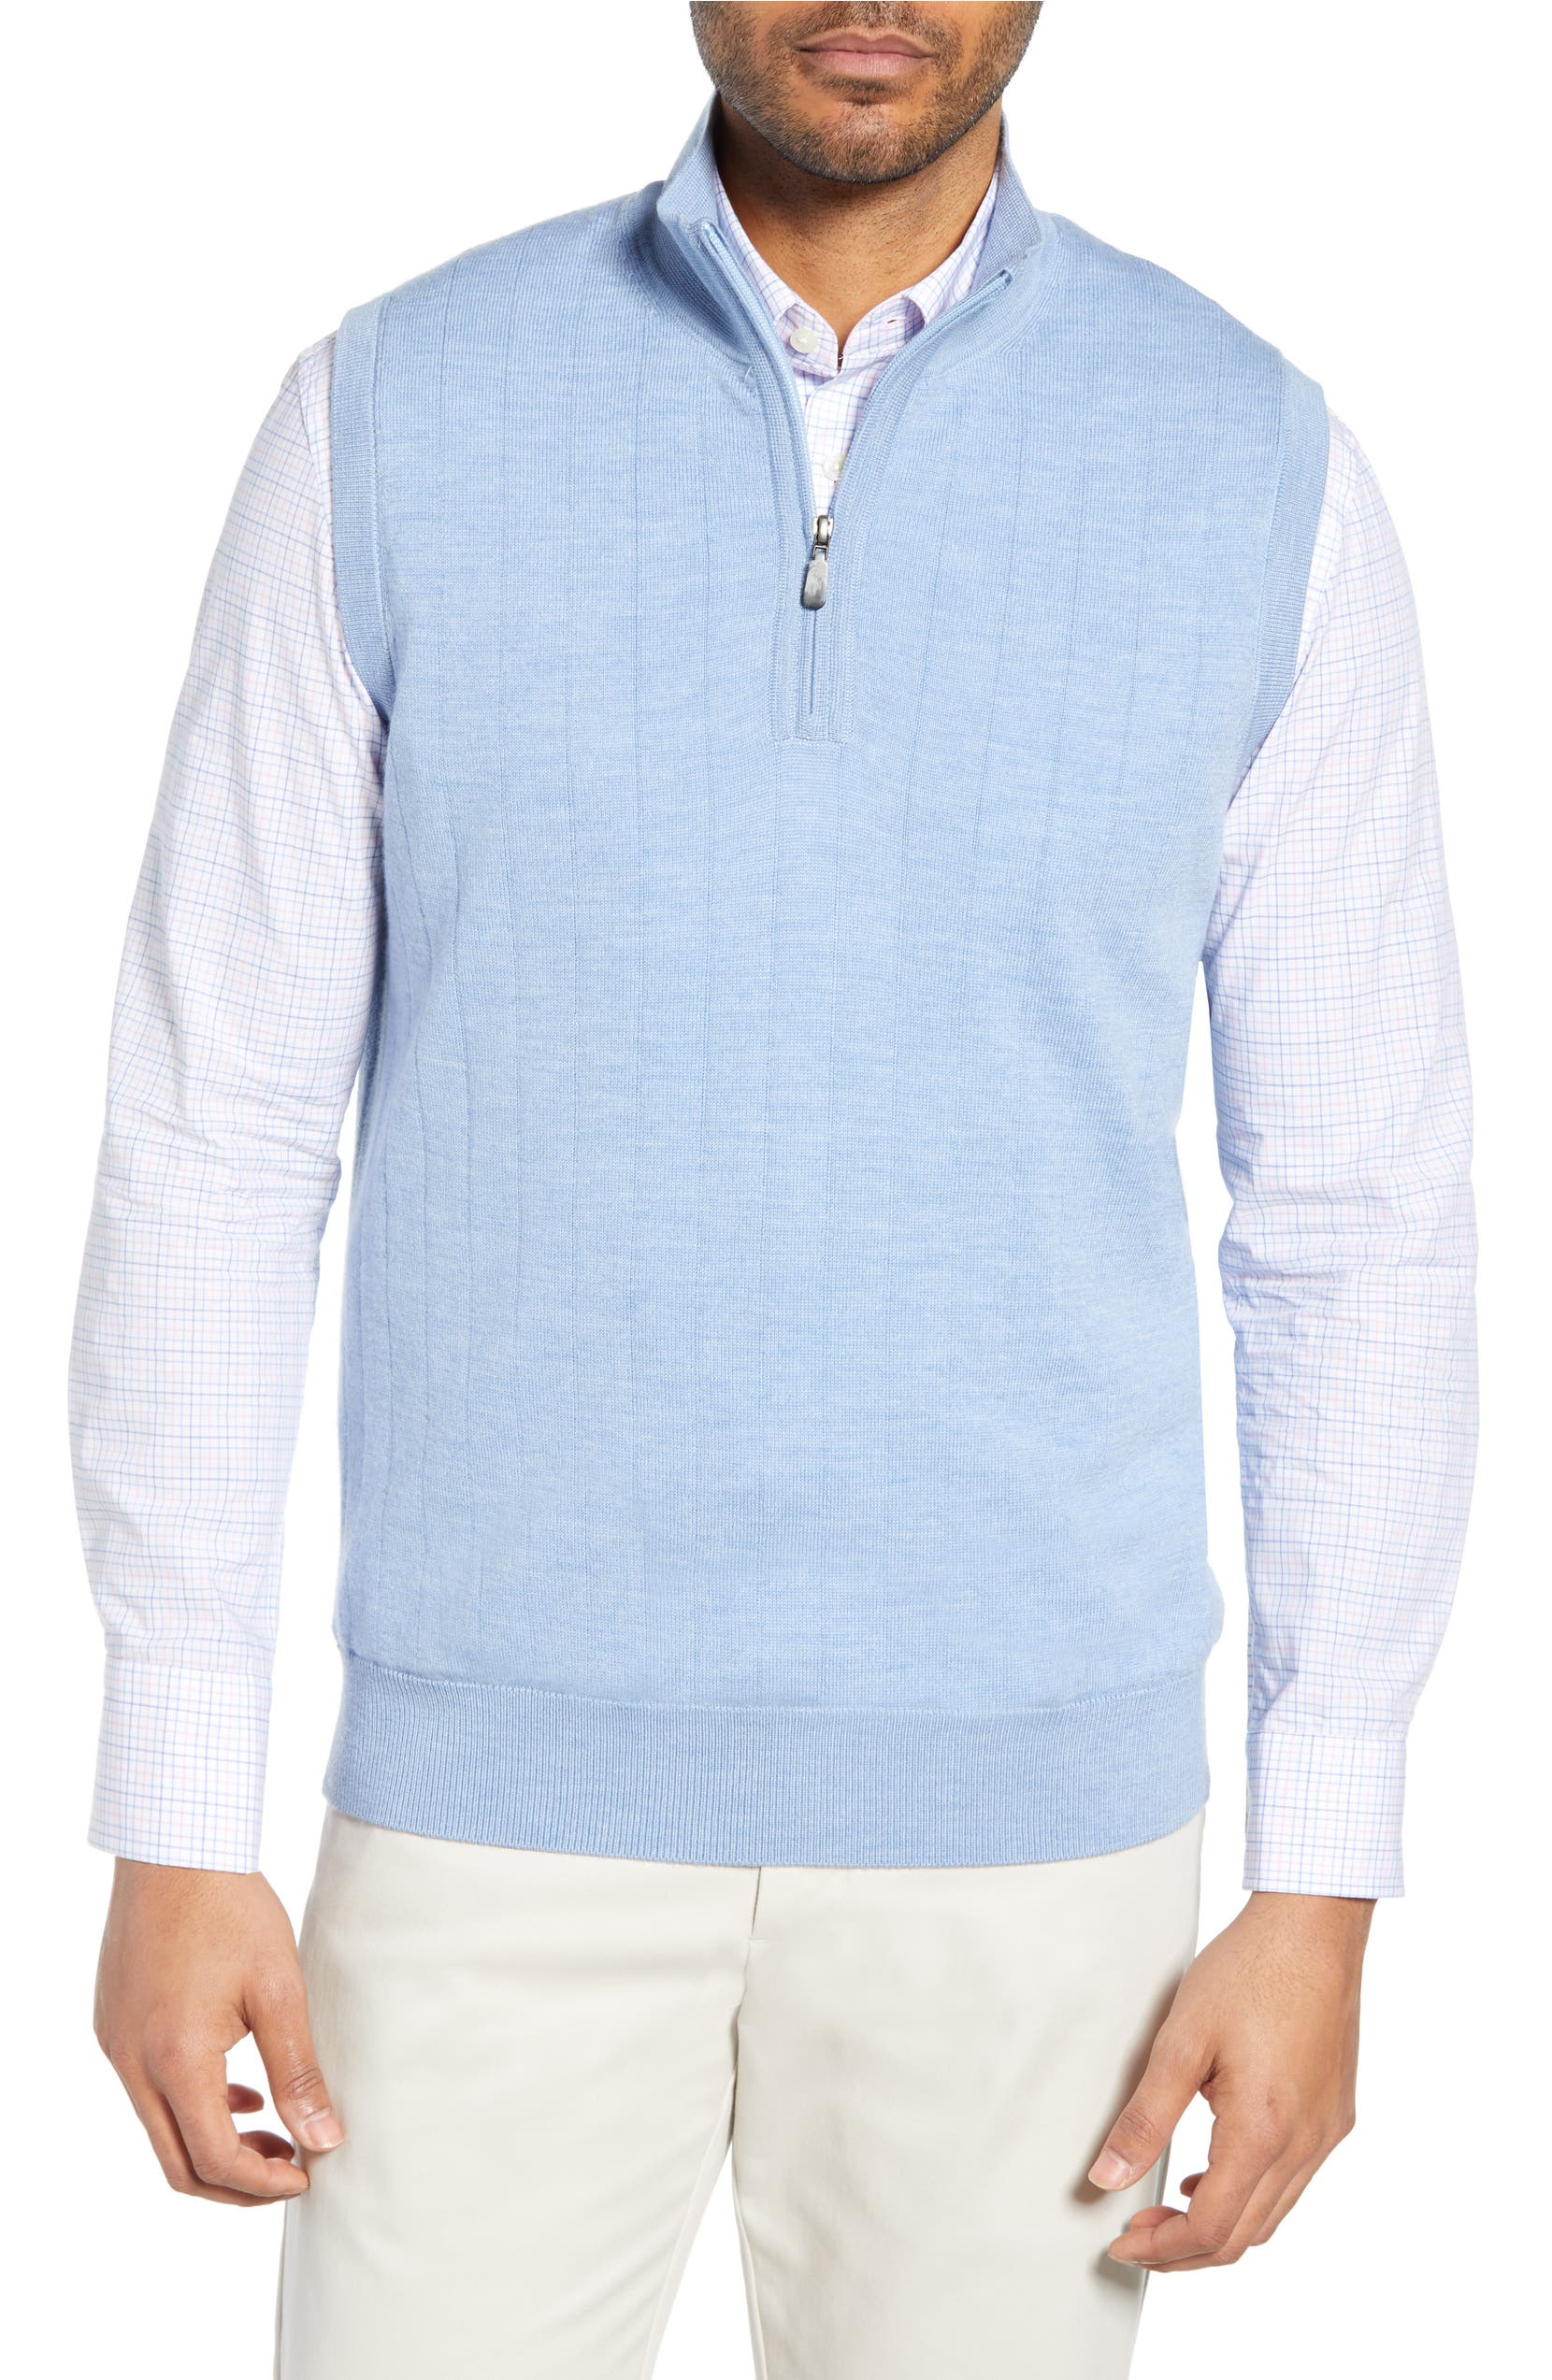 2fa3f9e88277fd Bobby Jones Quarter Zip Wool Sweater Vest | Nordstrom